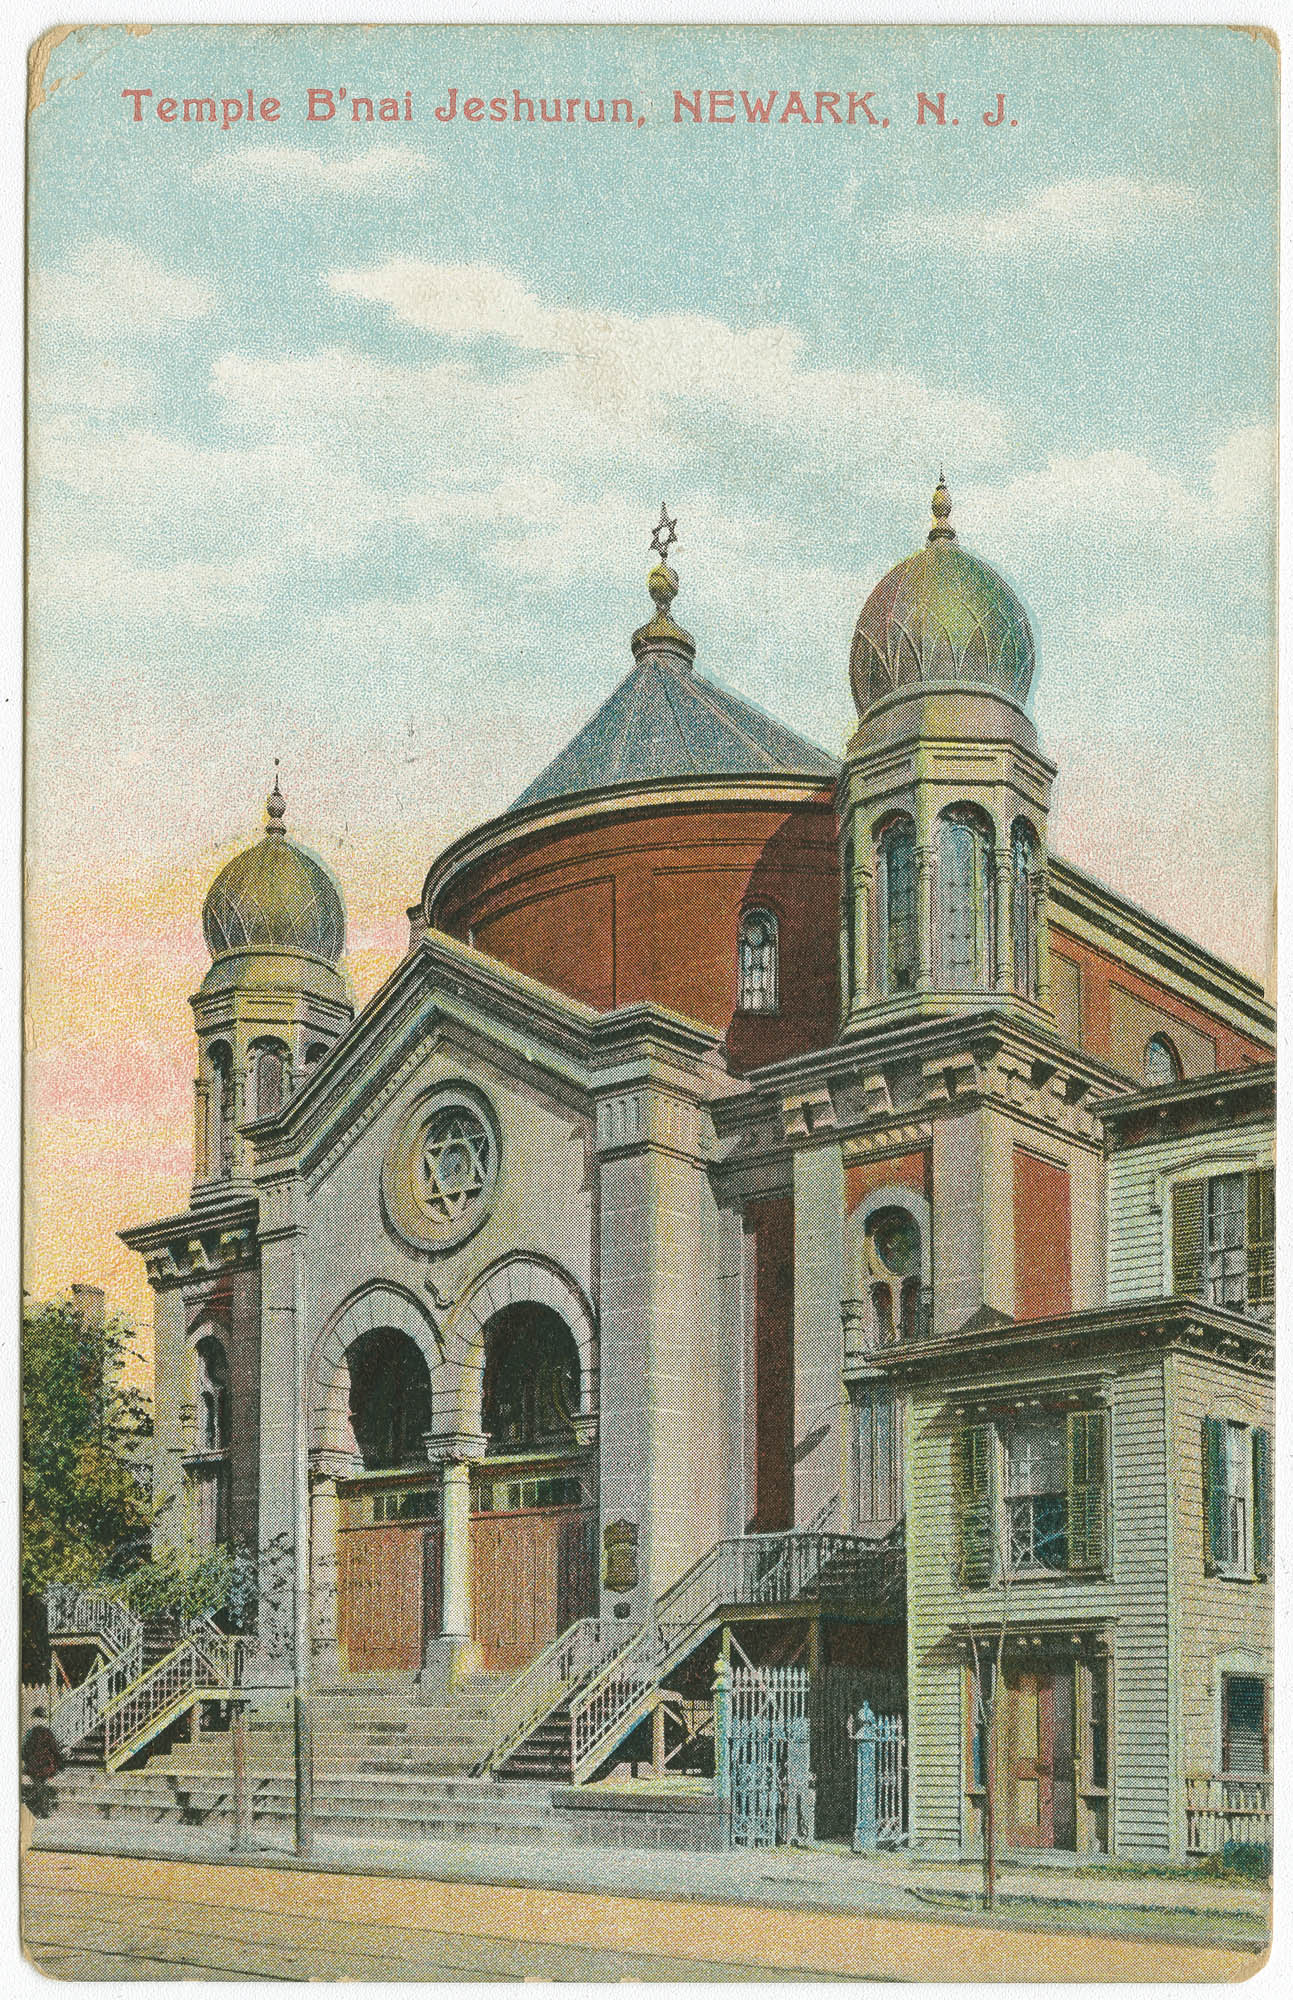 Temple B'nai Jeshurun, Newark, N.J.